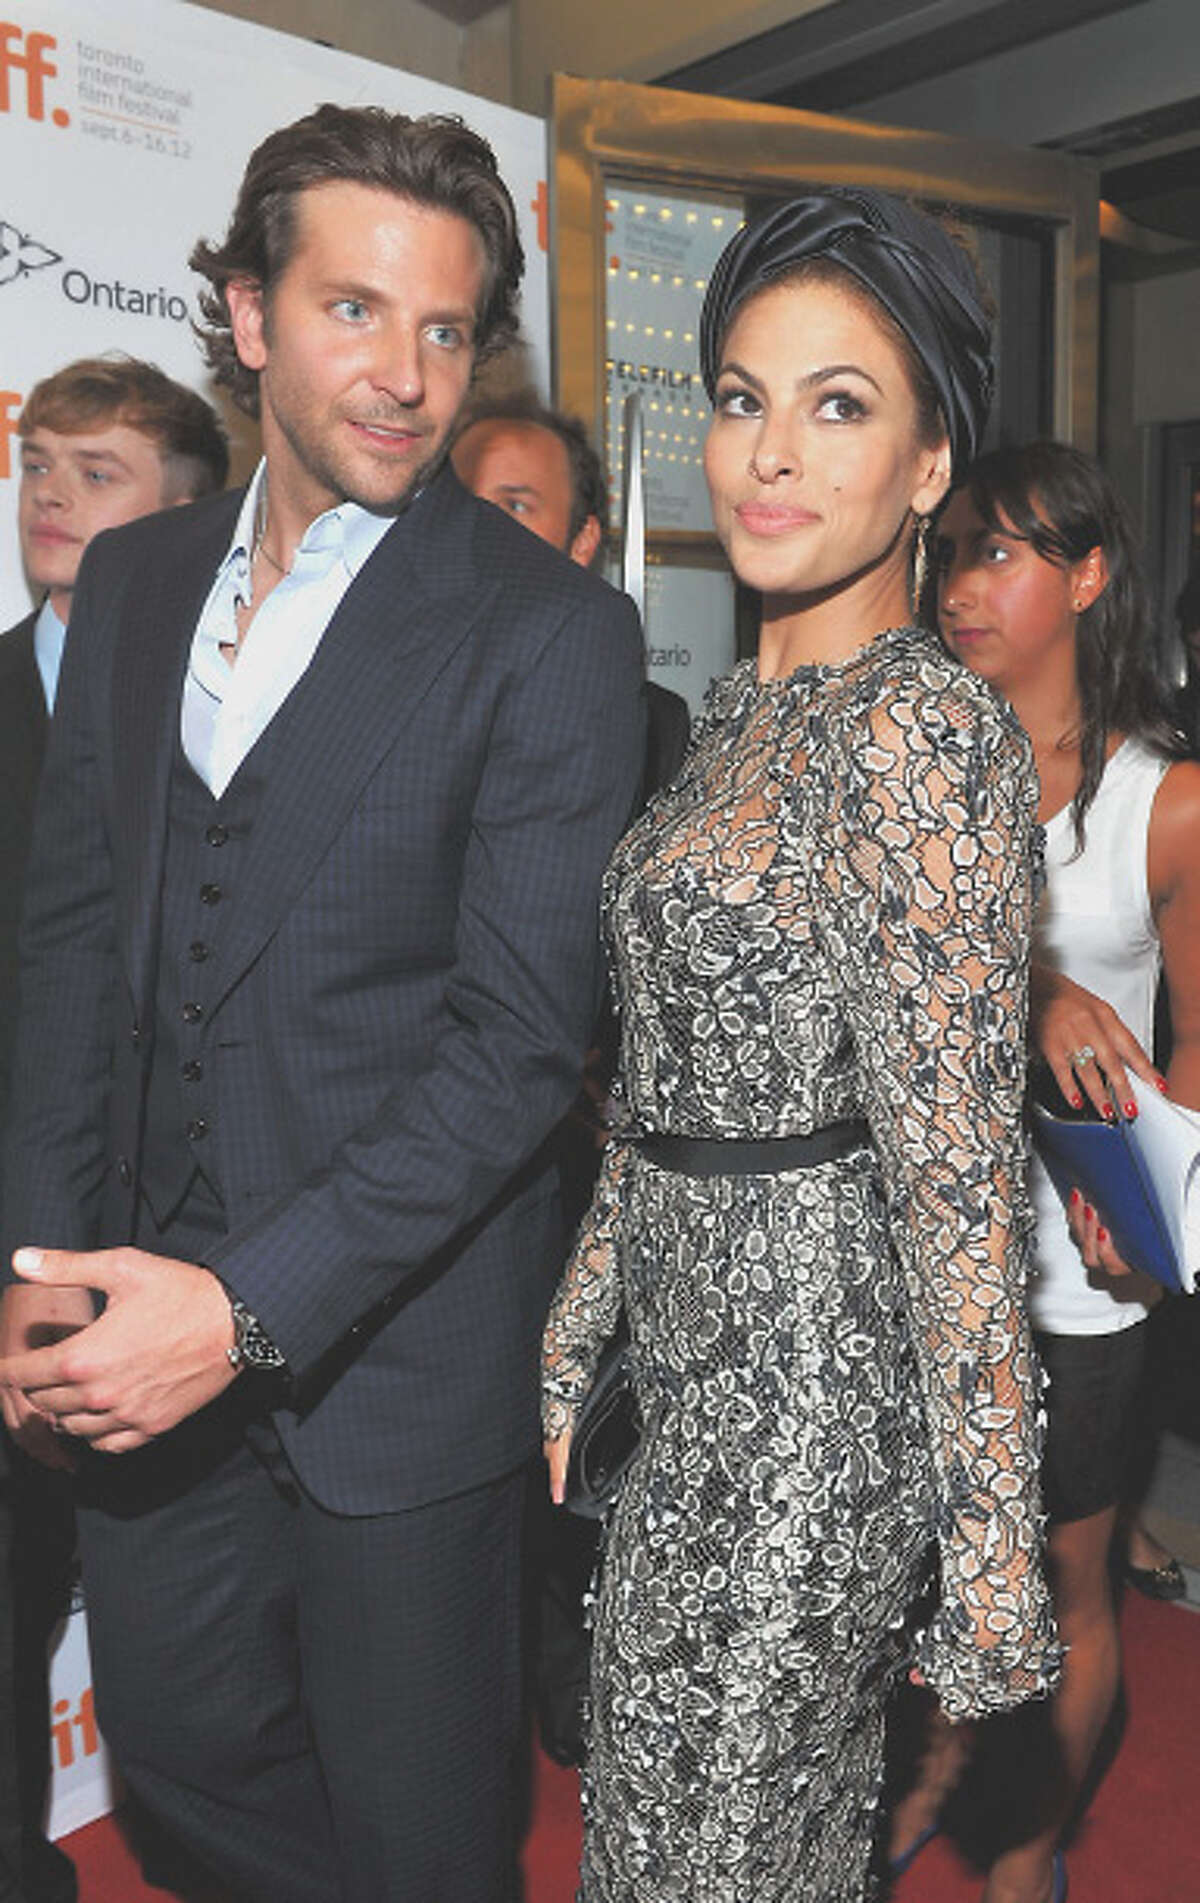 Actors Bradley Cooper and Eva Mendes attend